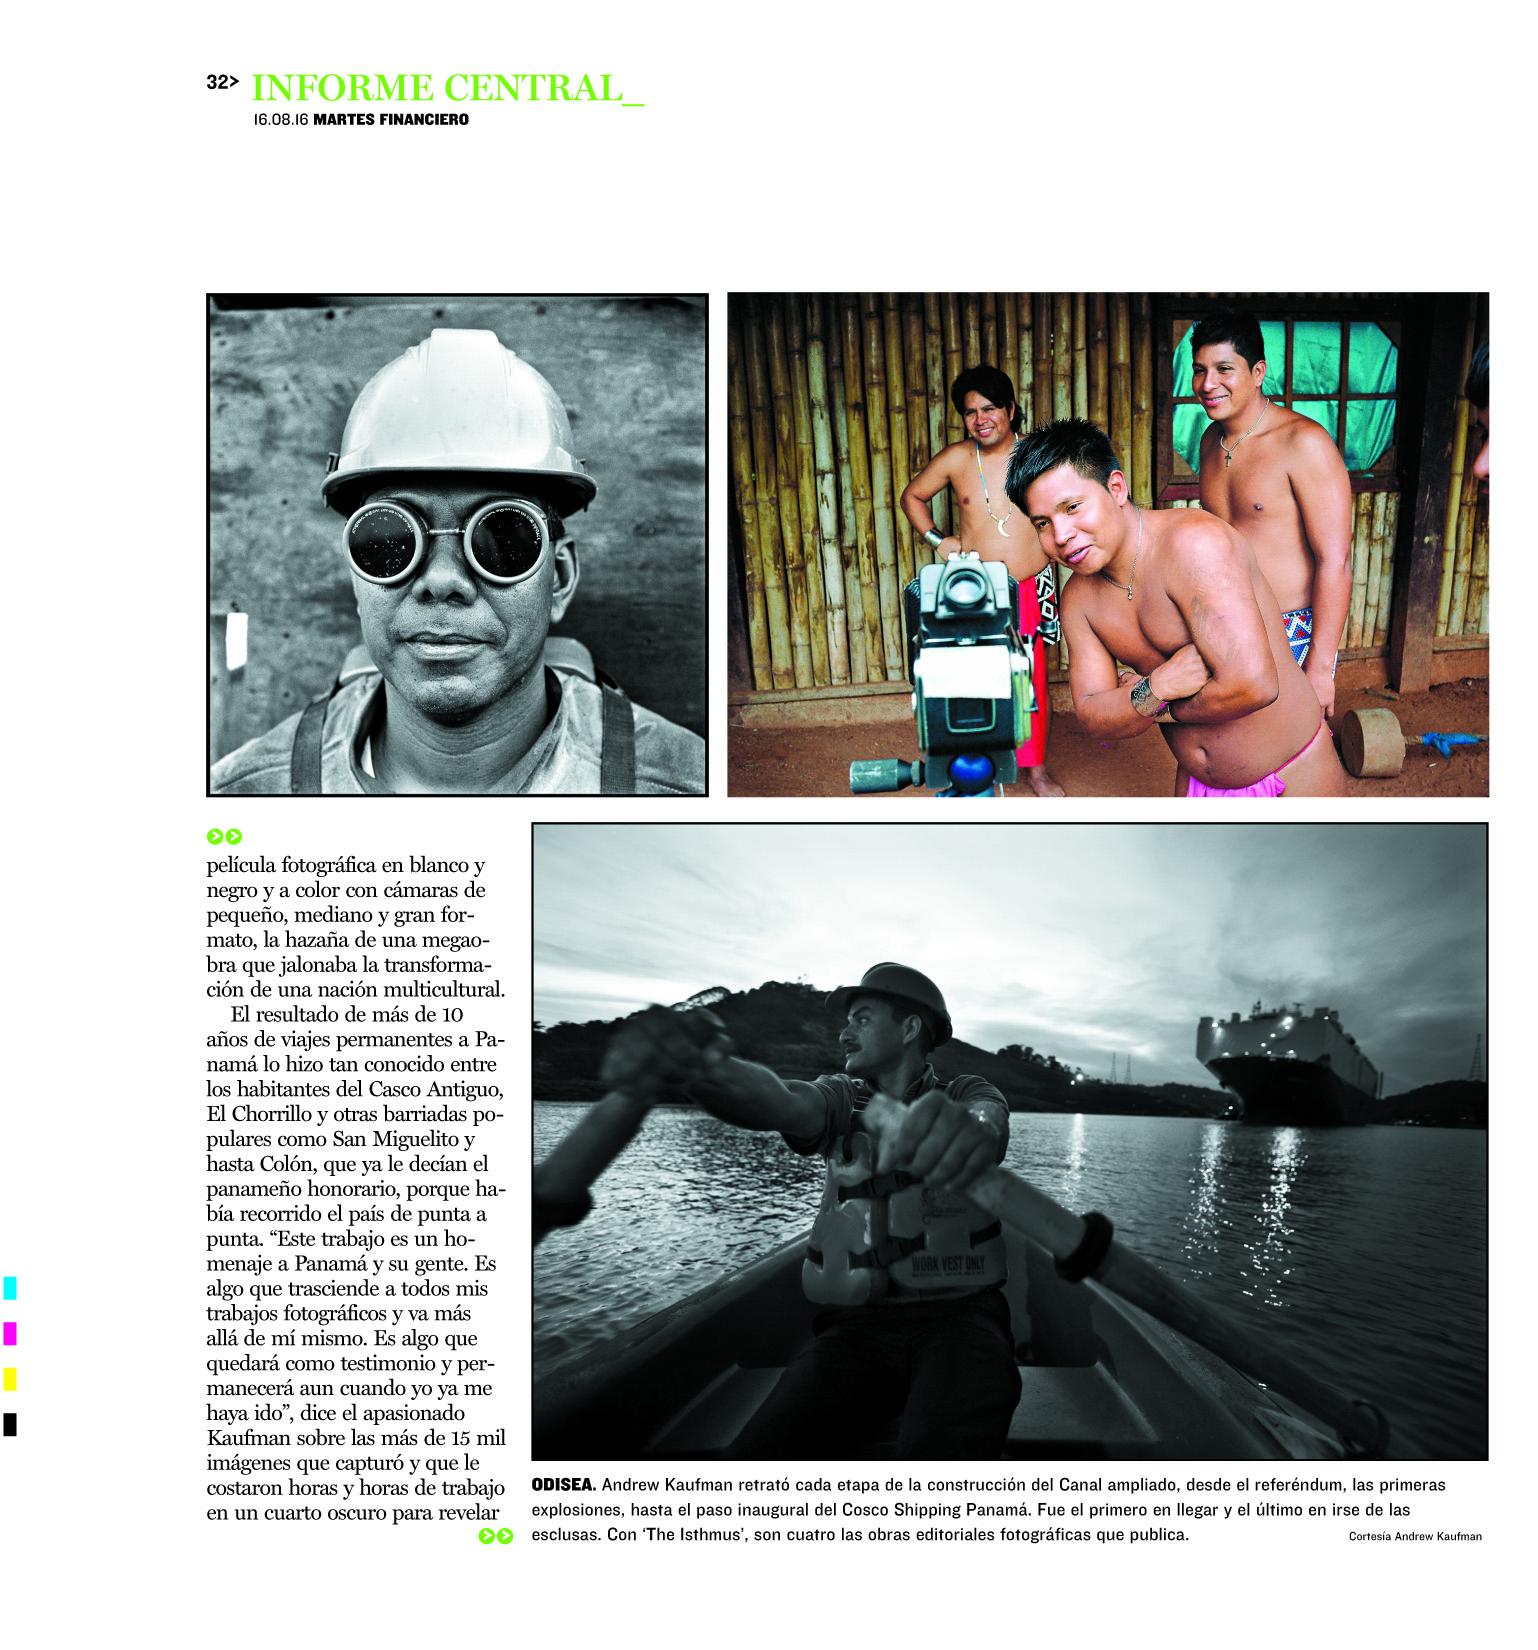 Informe5 copy.jpg